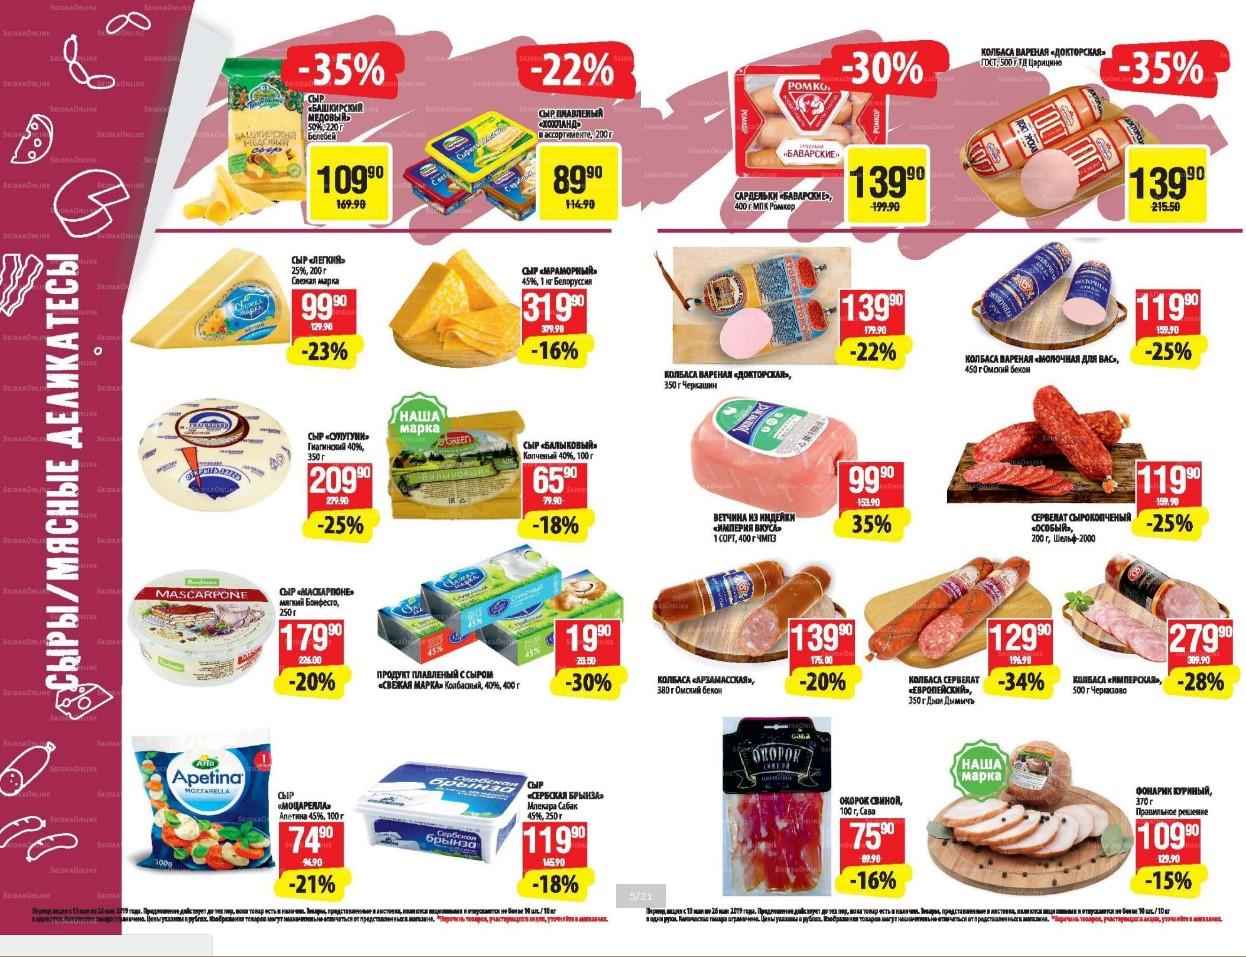 Каталог гипермаркетов Райт 13-26.05.2019 стр.03